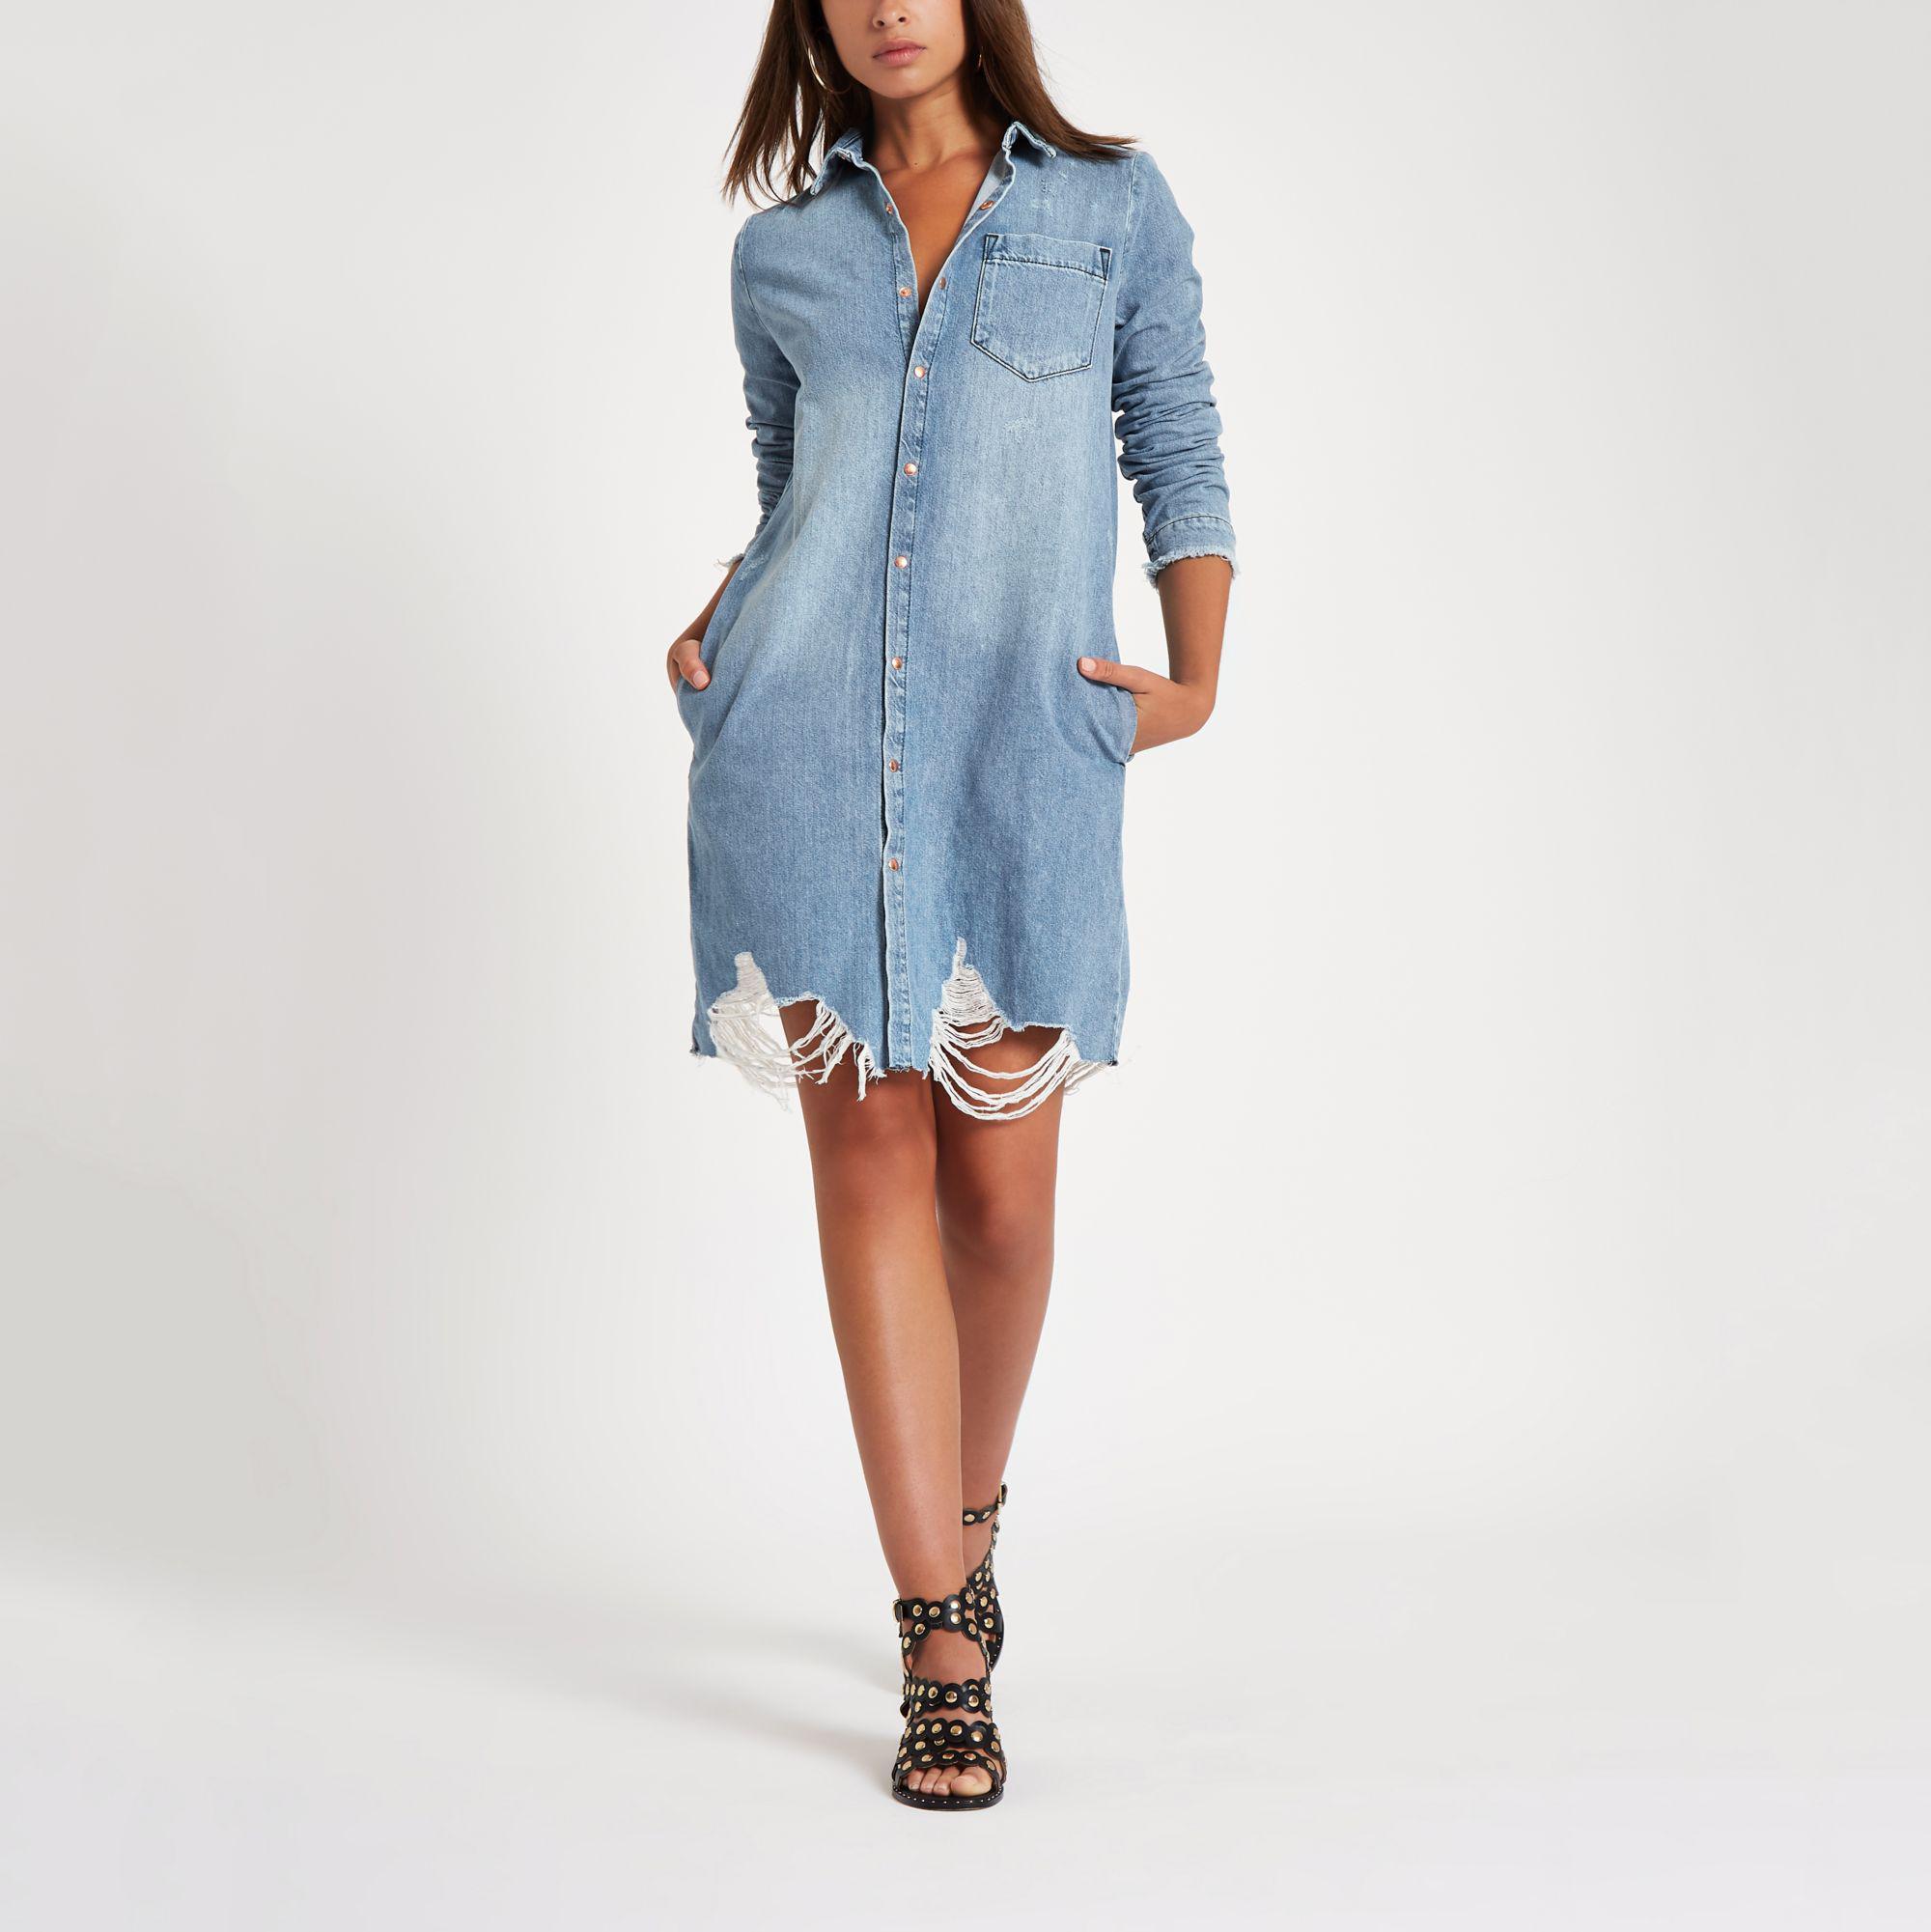 bf8a611e05 River Island Ripped Denim Shirt Dress in Blue - Lyst